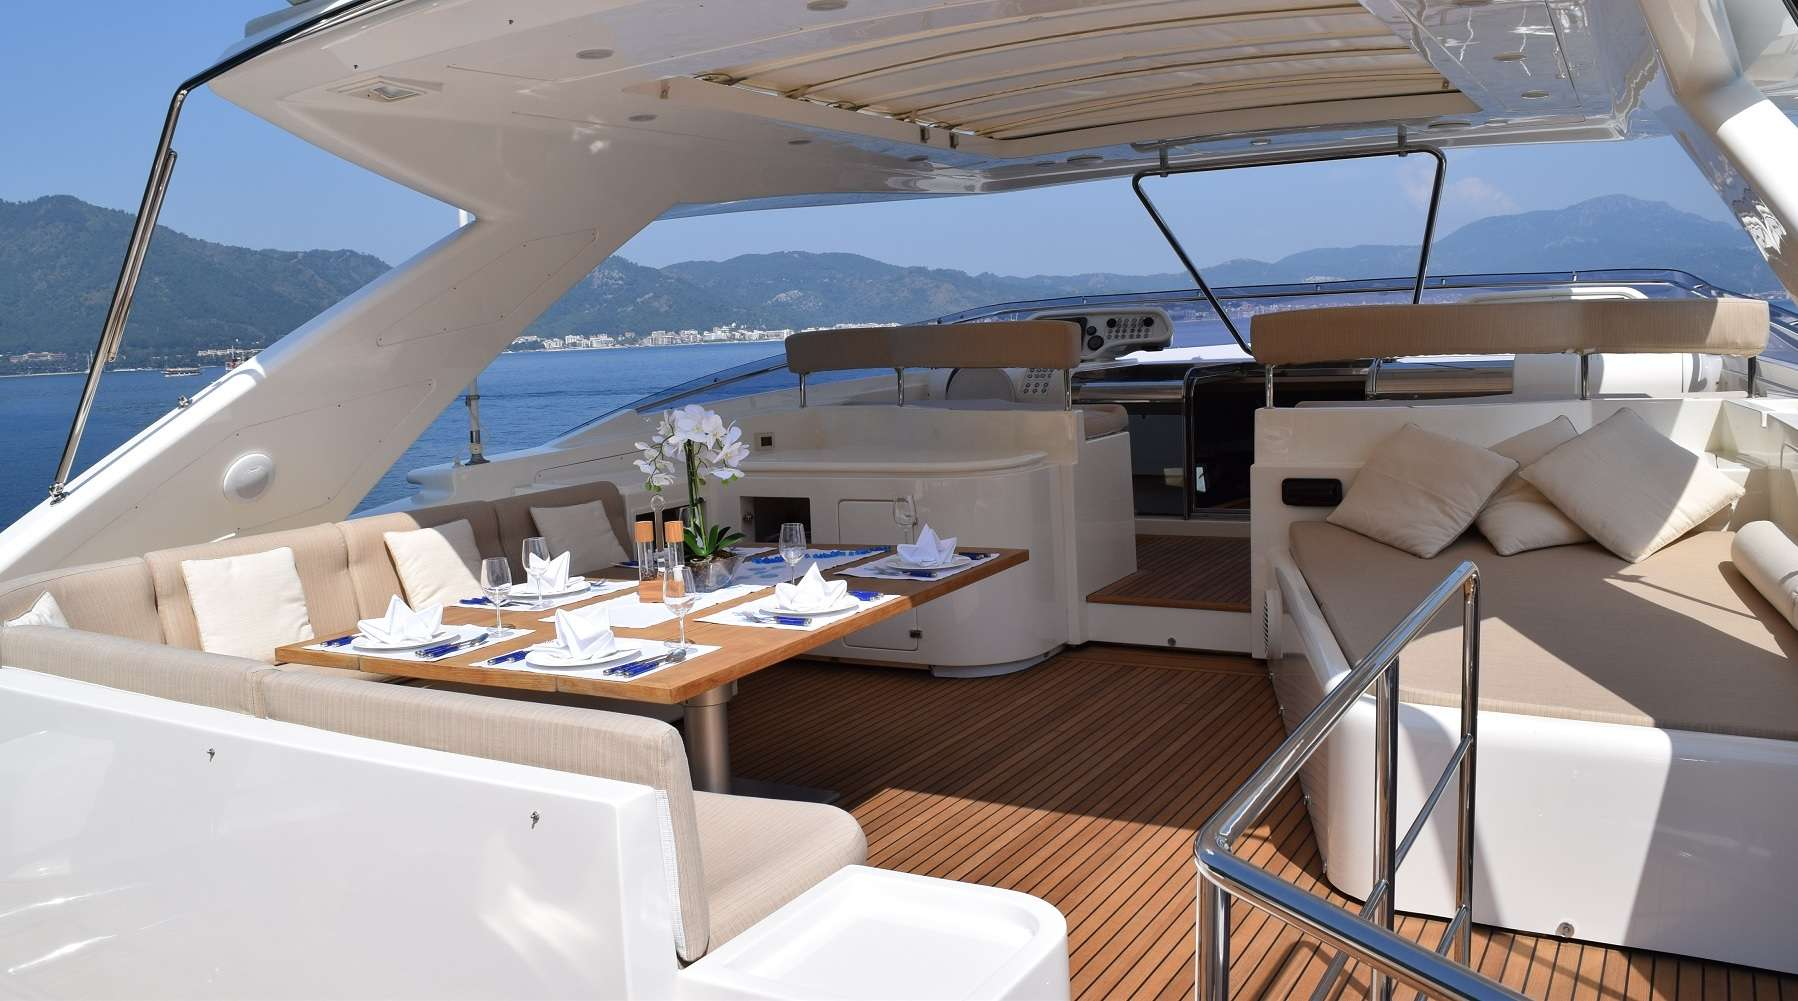 SEA LION II yacht image # 3